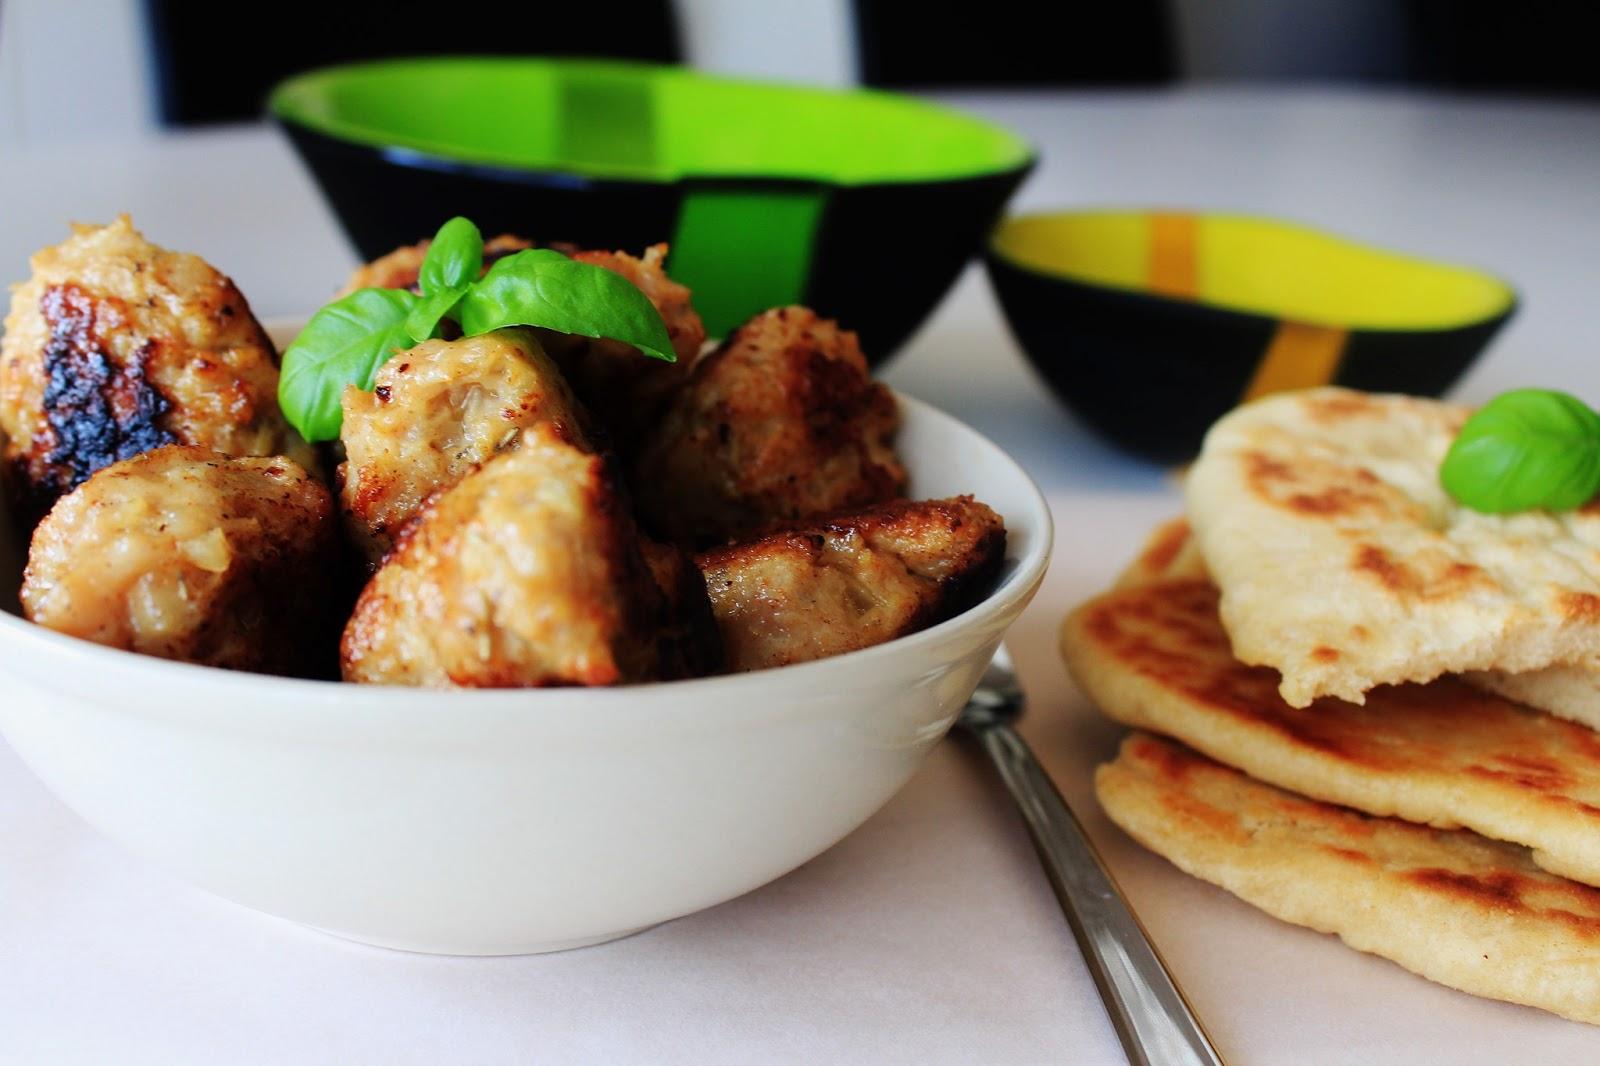 Kyllingekødboller Med Fladbrød – Nemme Kyllingefrikadeller